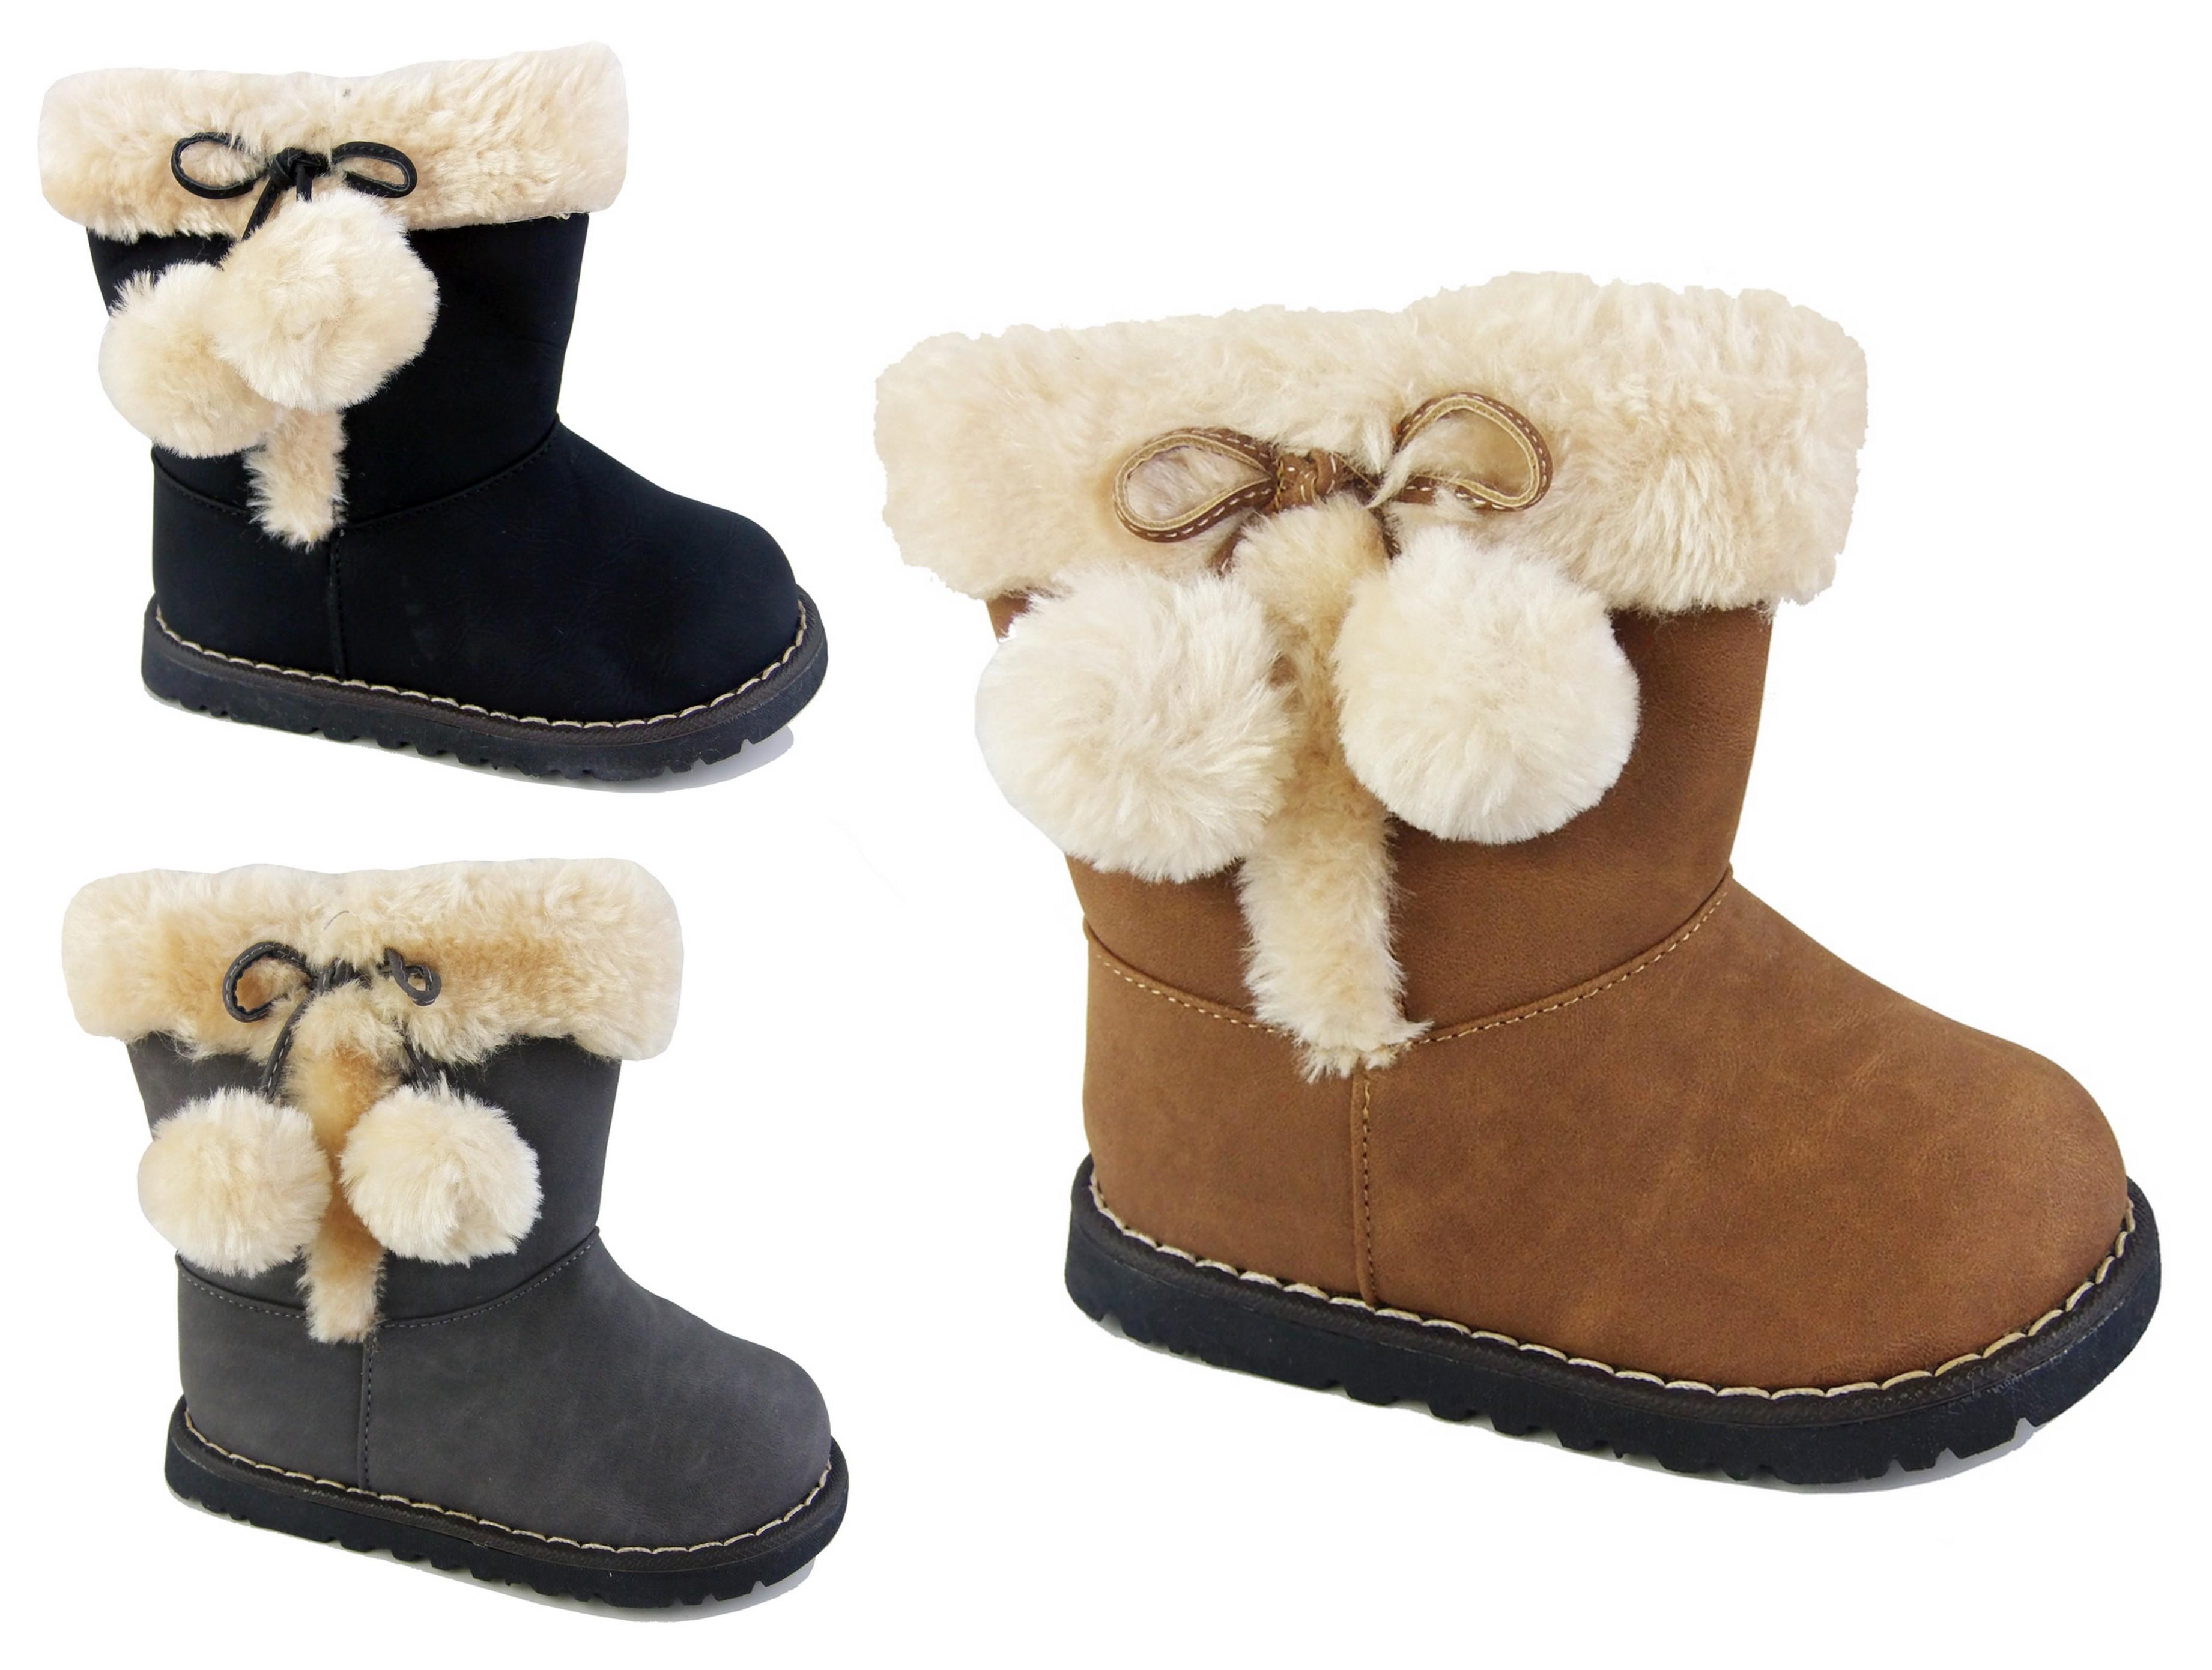 New Infant Girls Fur Lined Warm Winter Pom Pom Boots UK